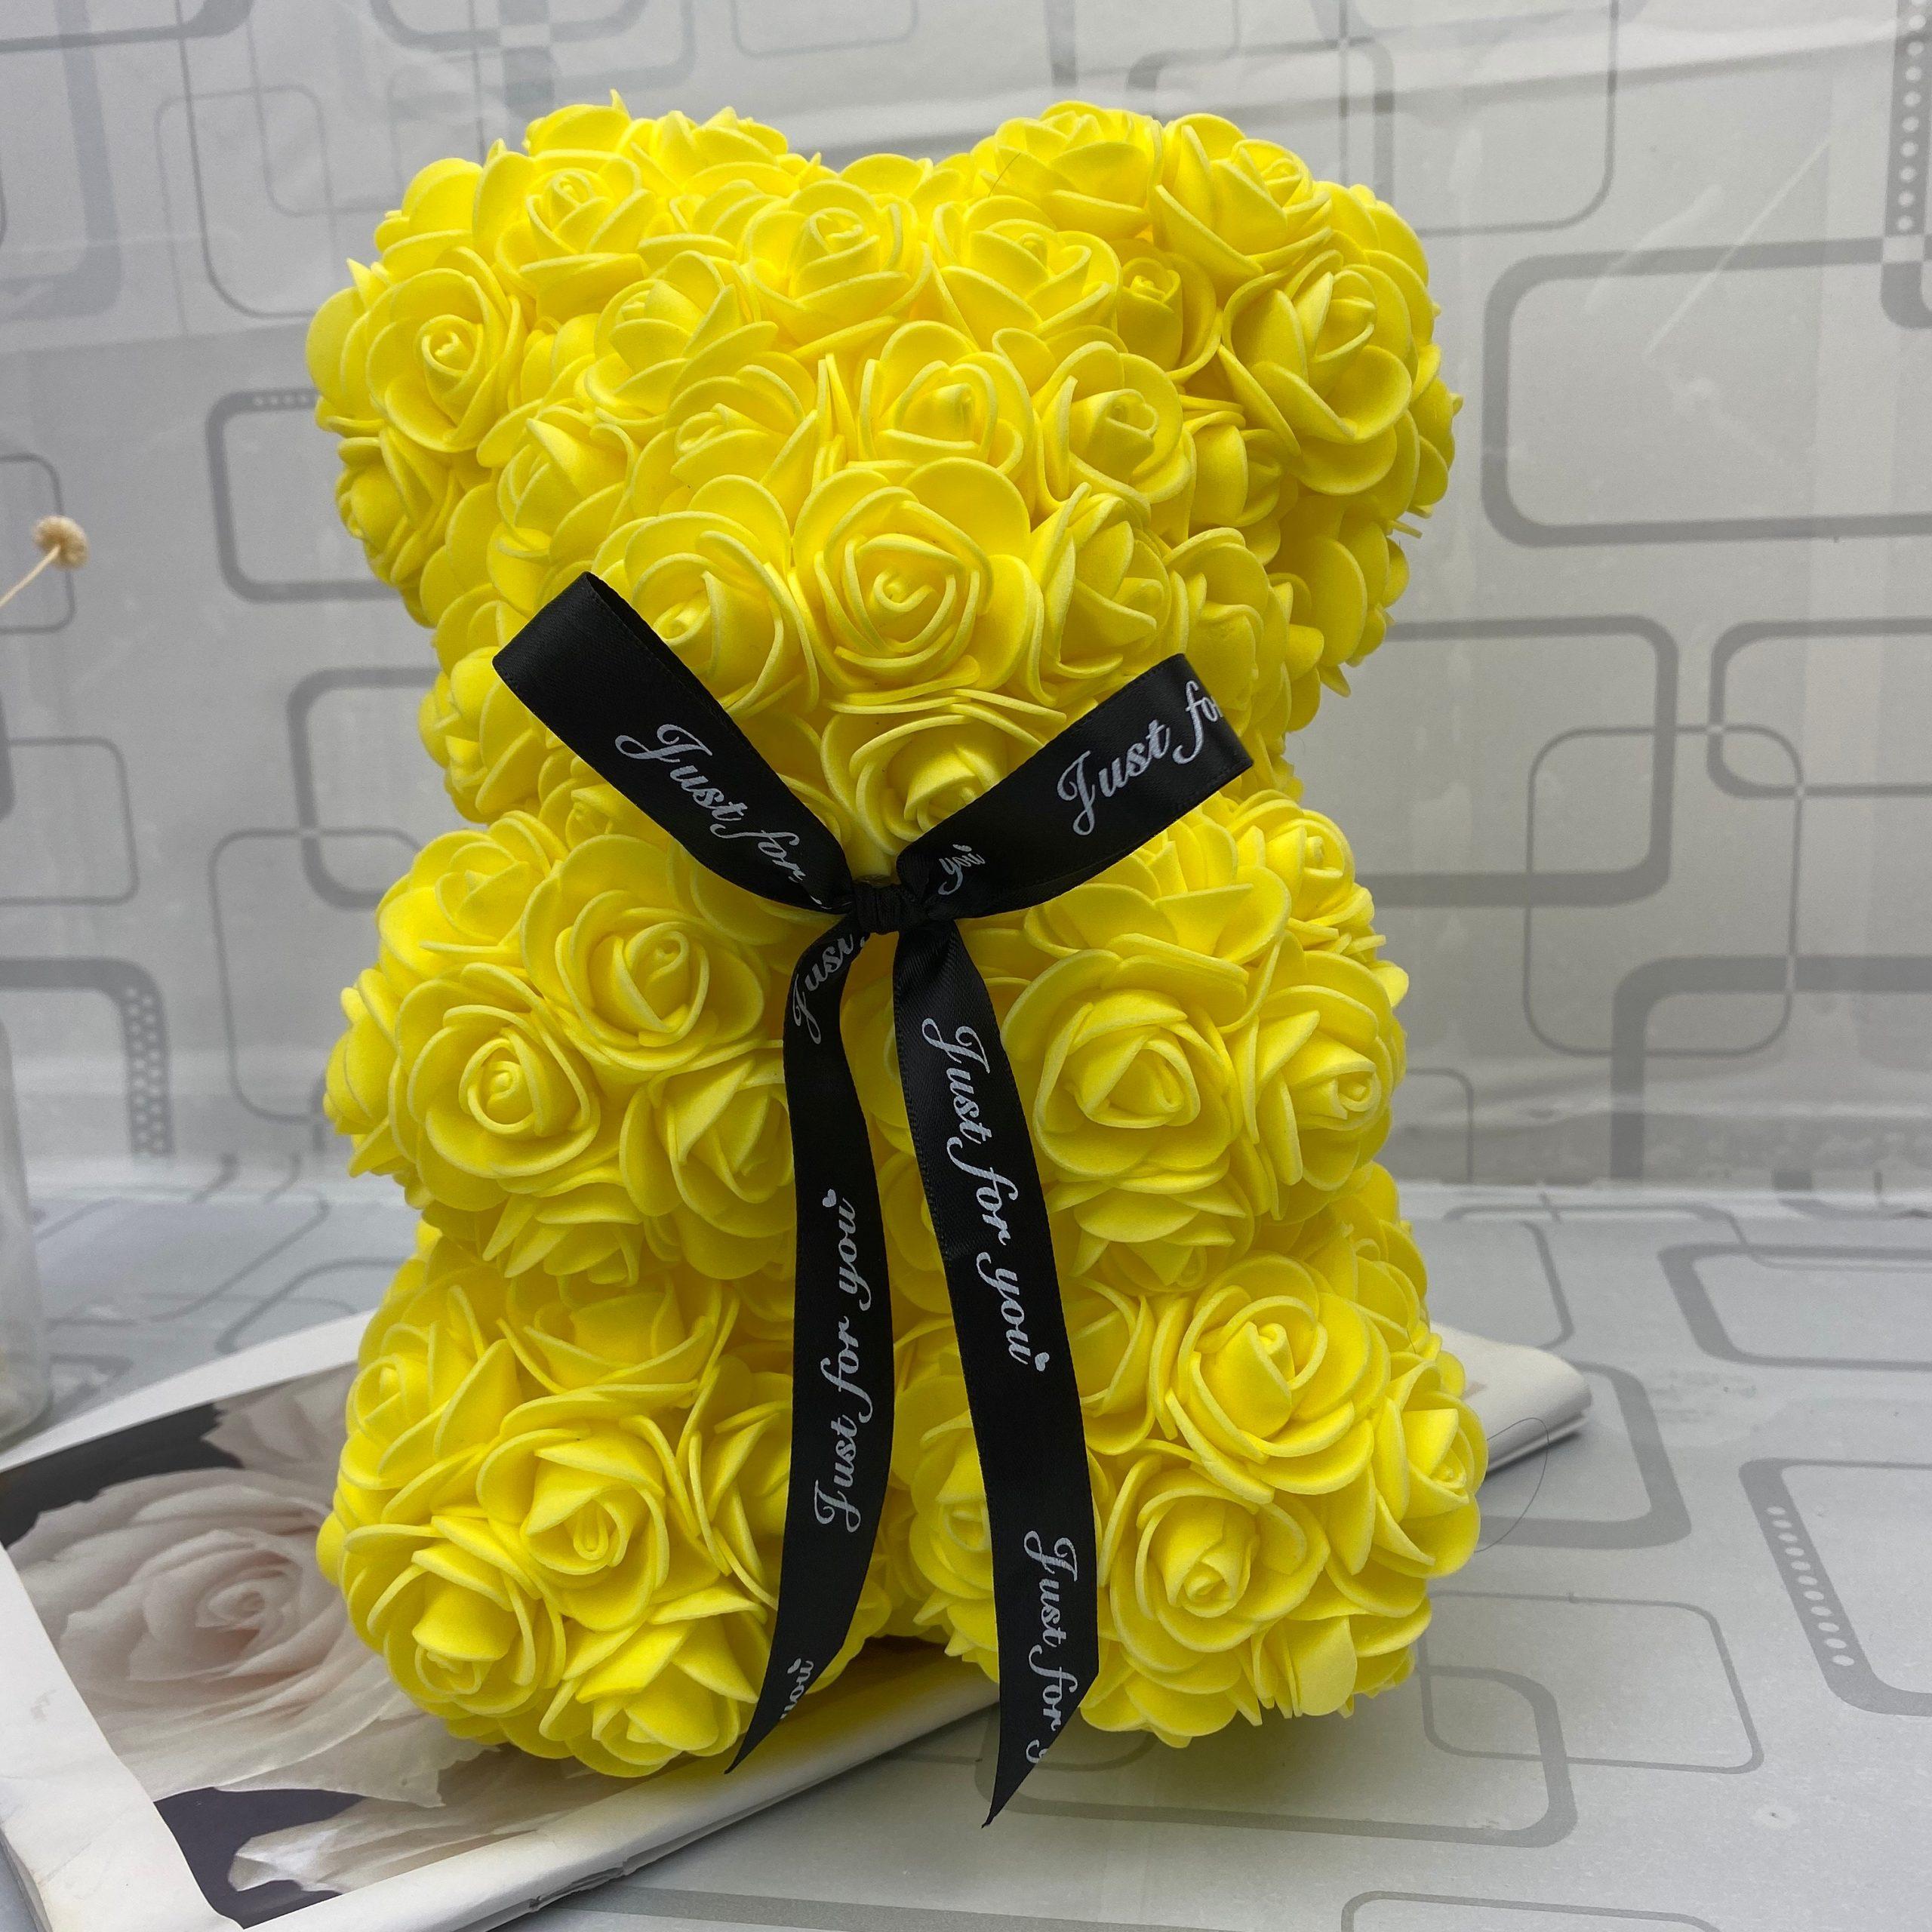 Rose Flower Teddy Bear